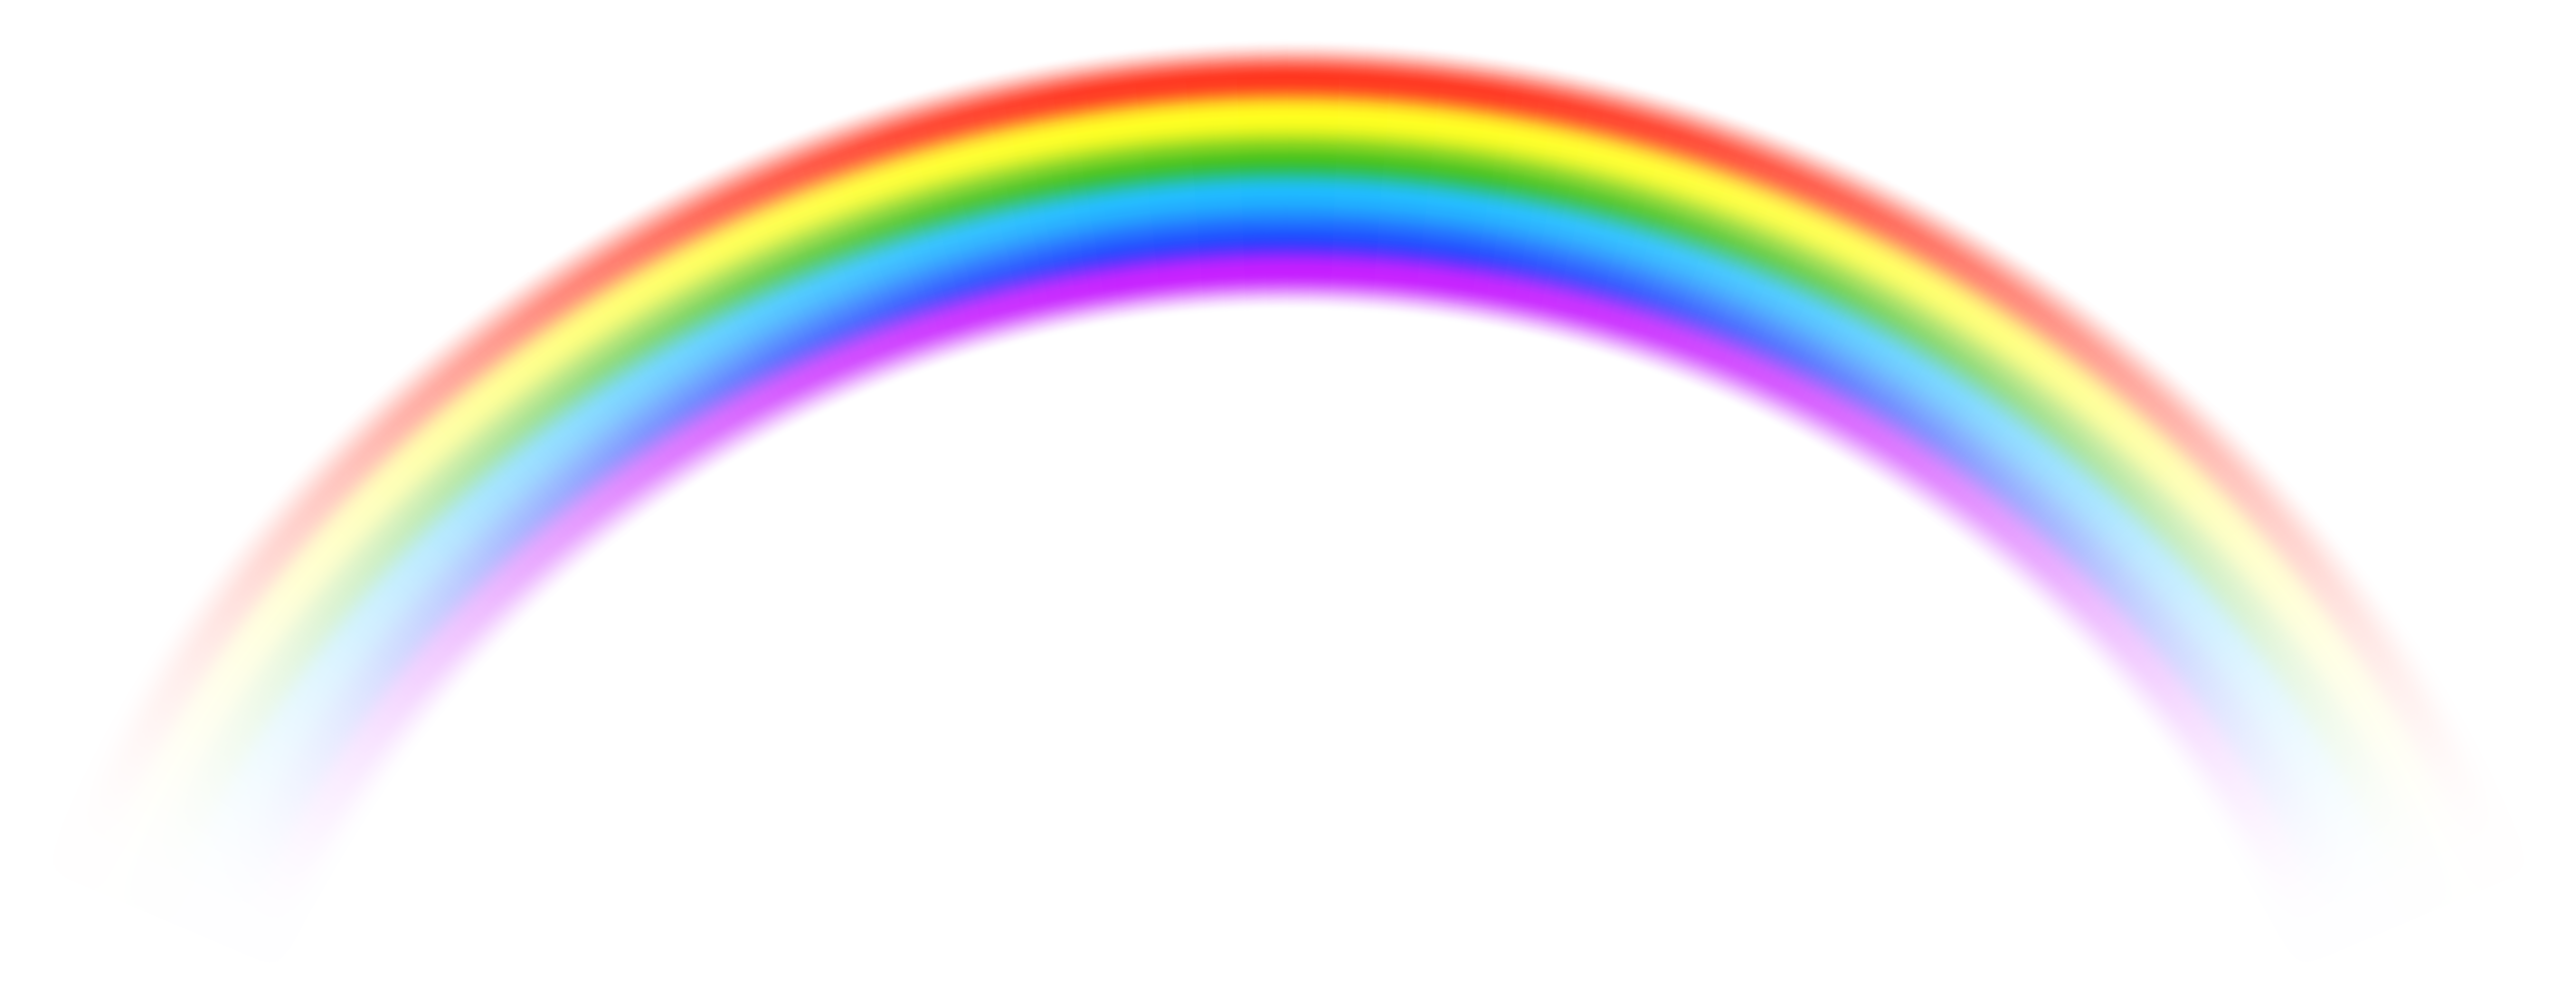 8000x3074 Transparent Rainbow Png Free Clip Art Imageu200b Gallery